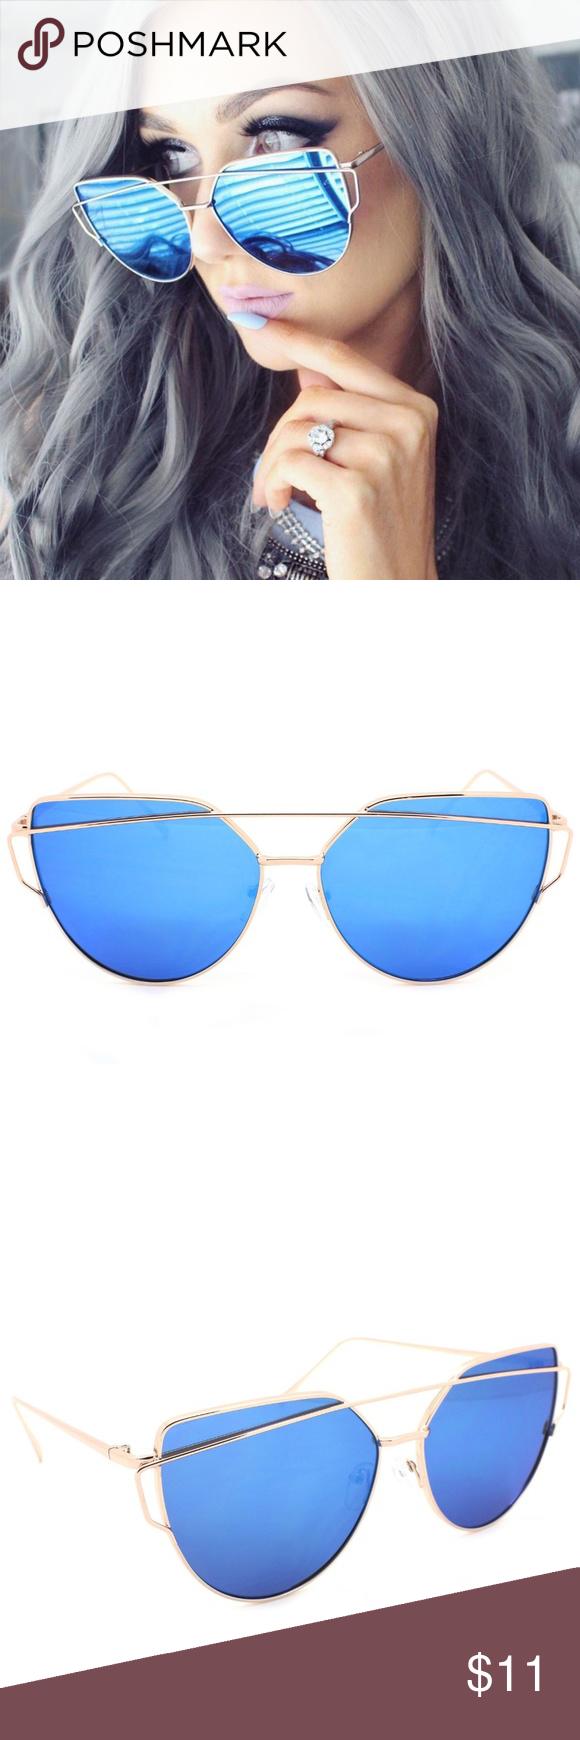 Large Cat Eye Sunglasses Blue Flat Mirrored Lens Large Oversized Cat Eye Sunglasses Flat Blue Mirrored Lens Metal Frame Women Fashion Cat Eye Sunglasses Blue Flats Sunglasses